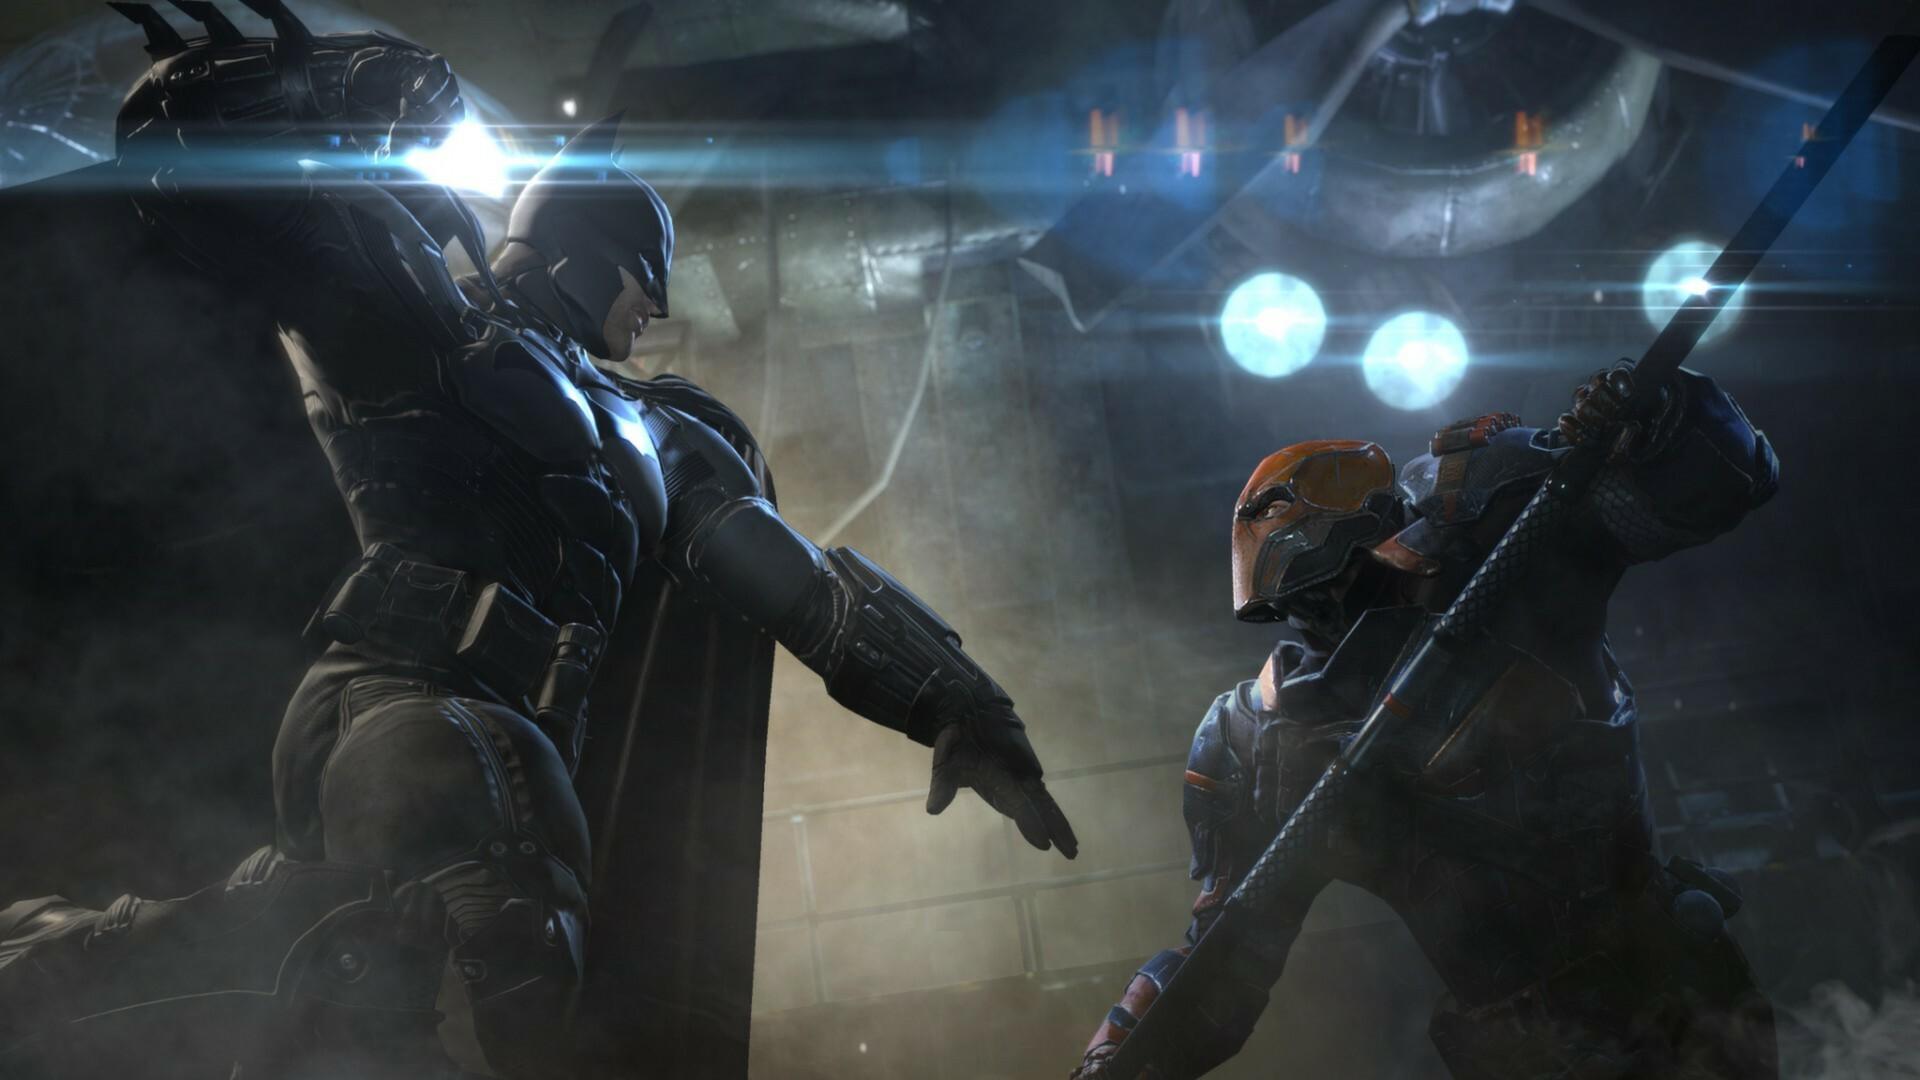 batman-arkham-origins-complete-edition-pc-screenshot-04